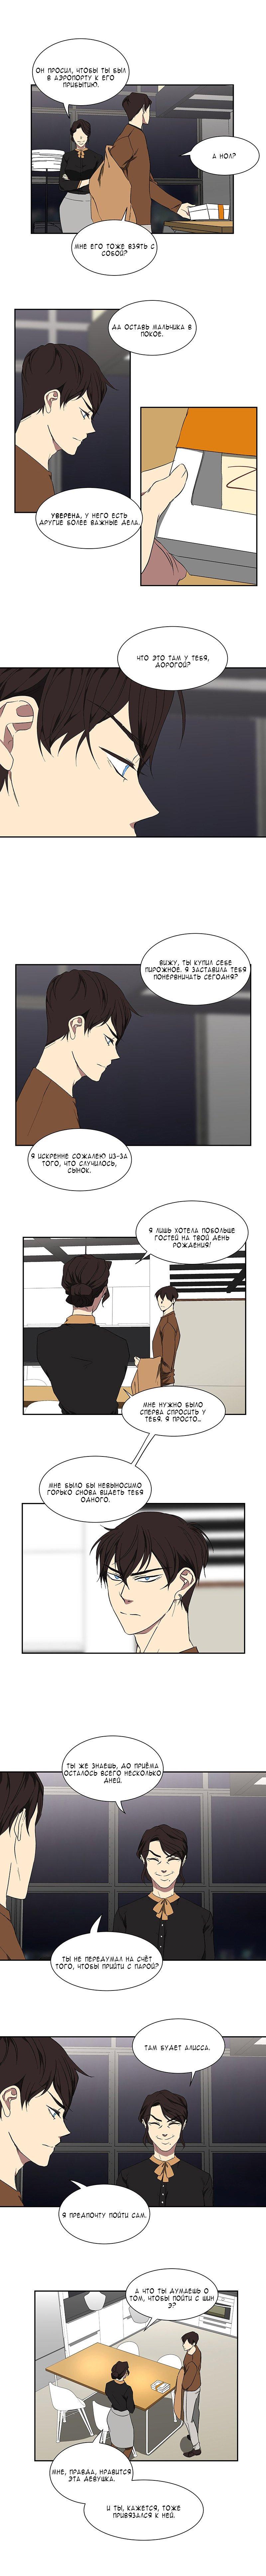 Манга Я люблю Ю / I love Yoo  - Том 1 Глава 42 Страница 5